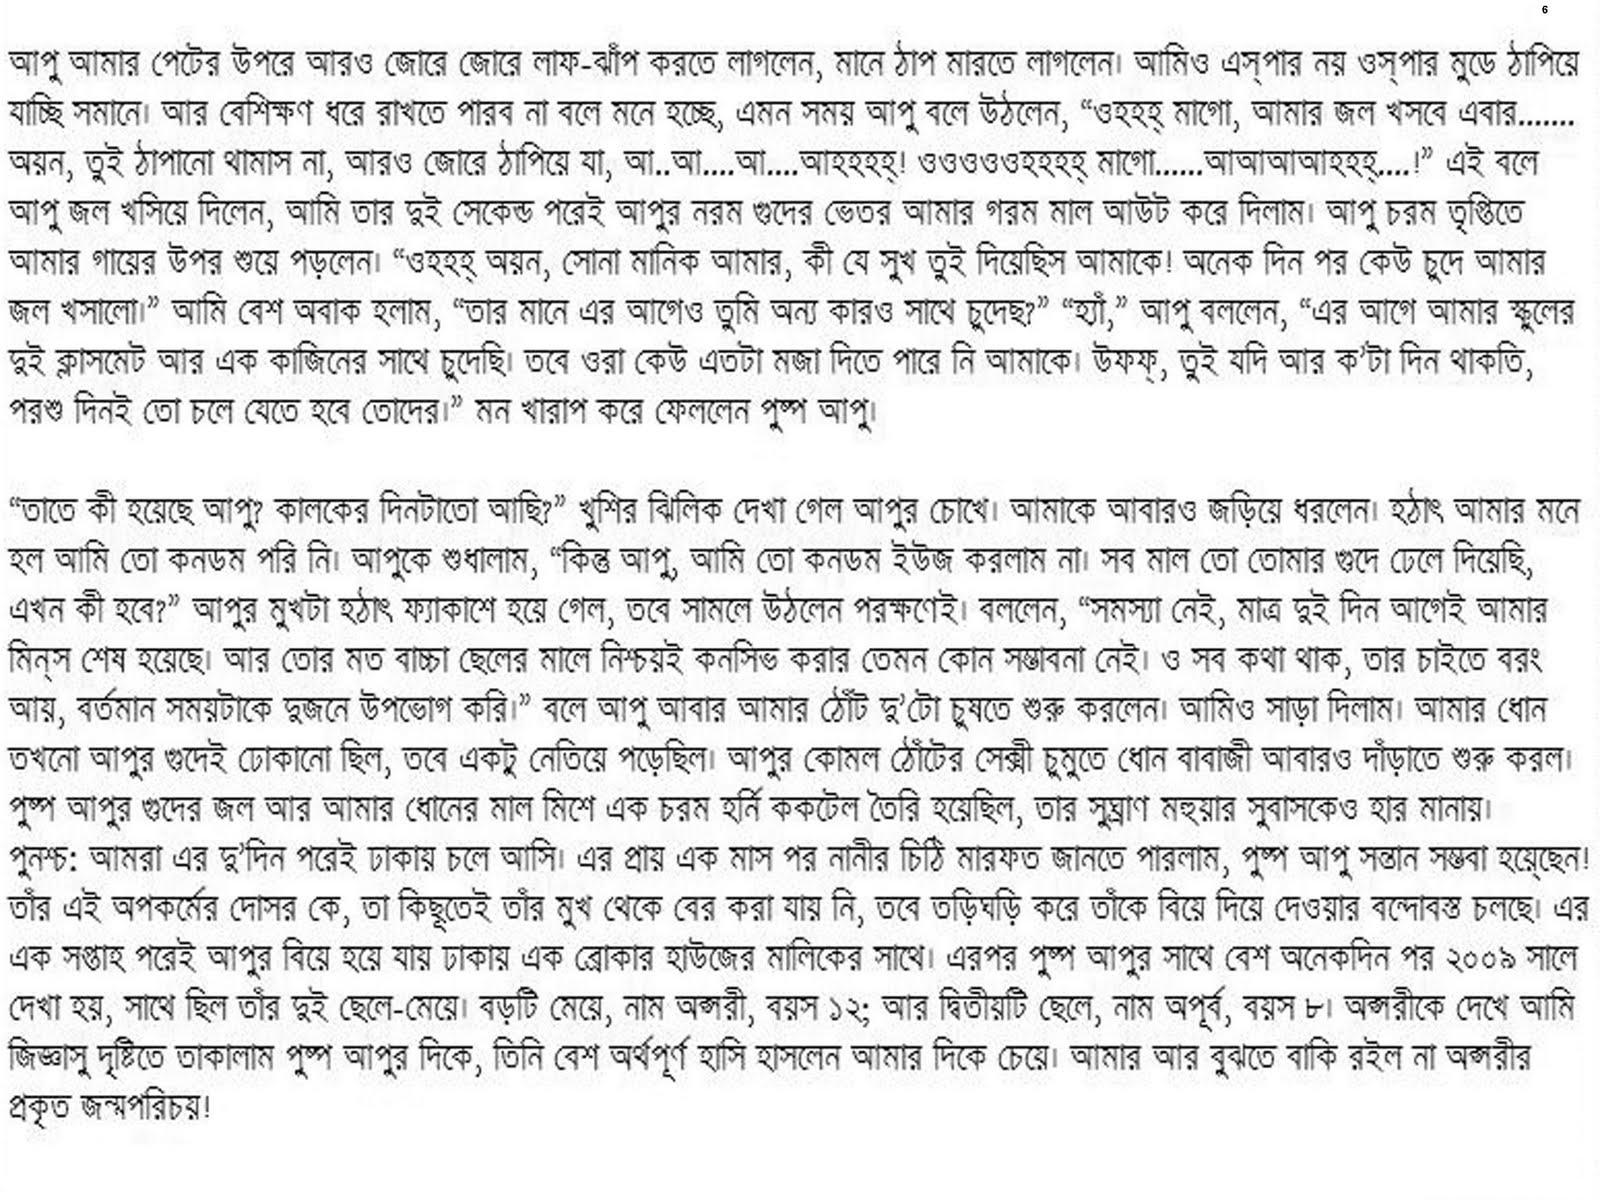 Bangla Choti karbar golpo: bangla gopon choti golpo